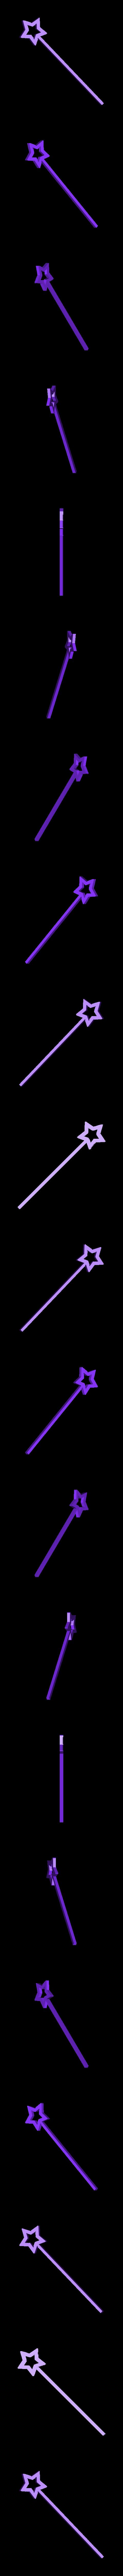 star_swizzle_stick_long_3dprintny.stl Download free STL file Holiday Party Picks and Swizzle Sticks • 3D print model, barb_3dprintny